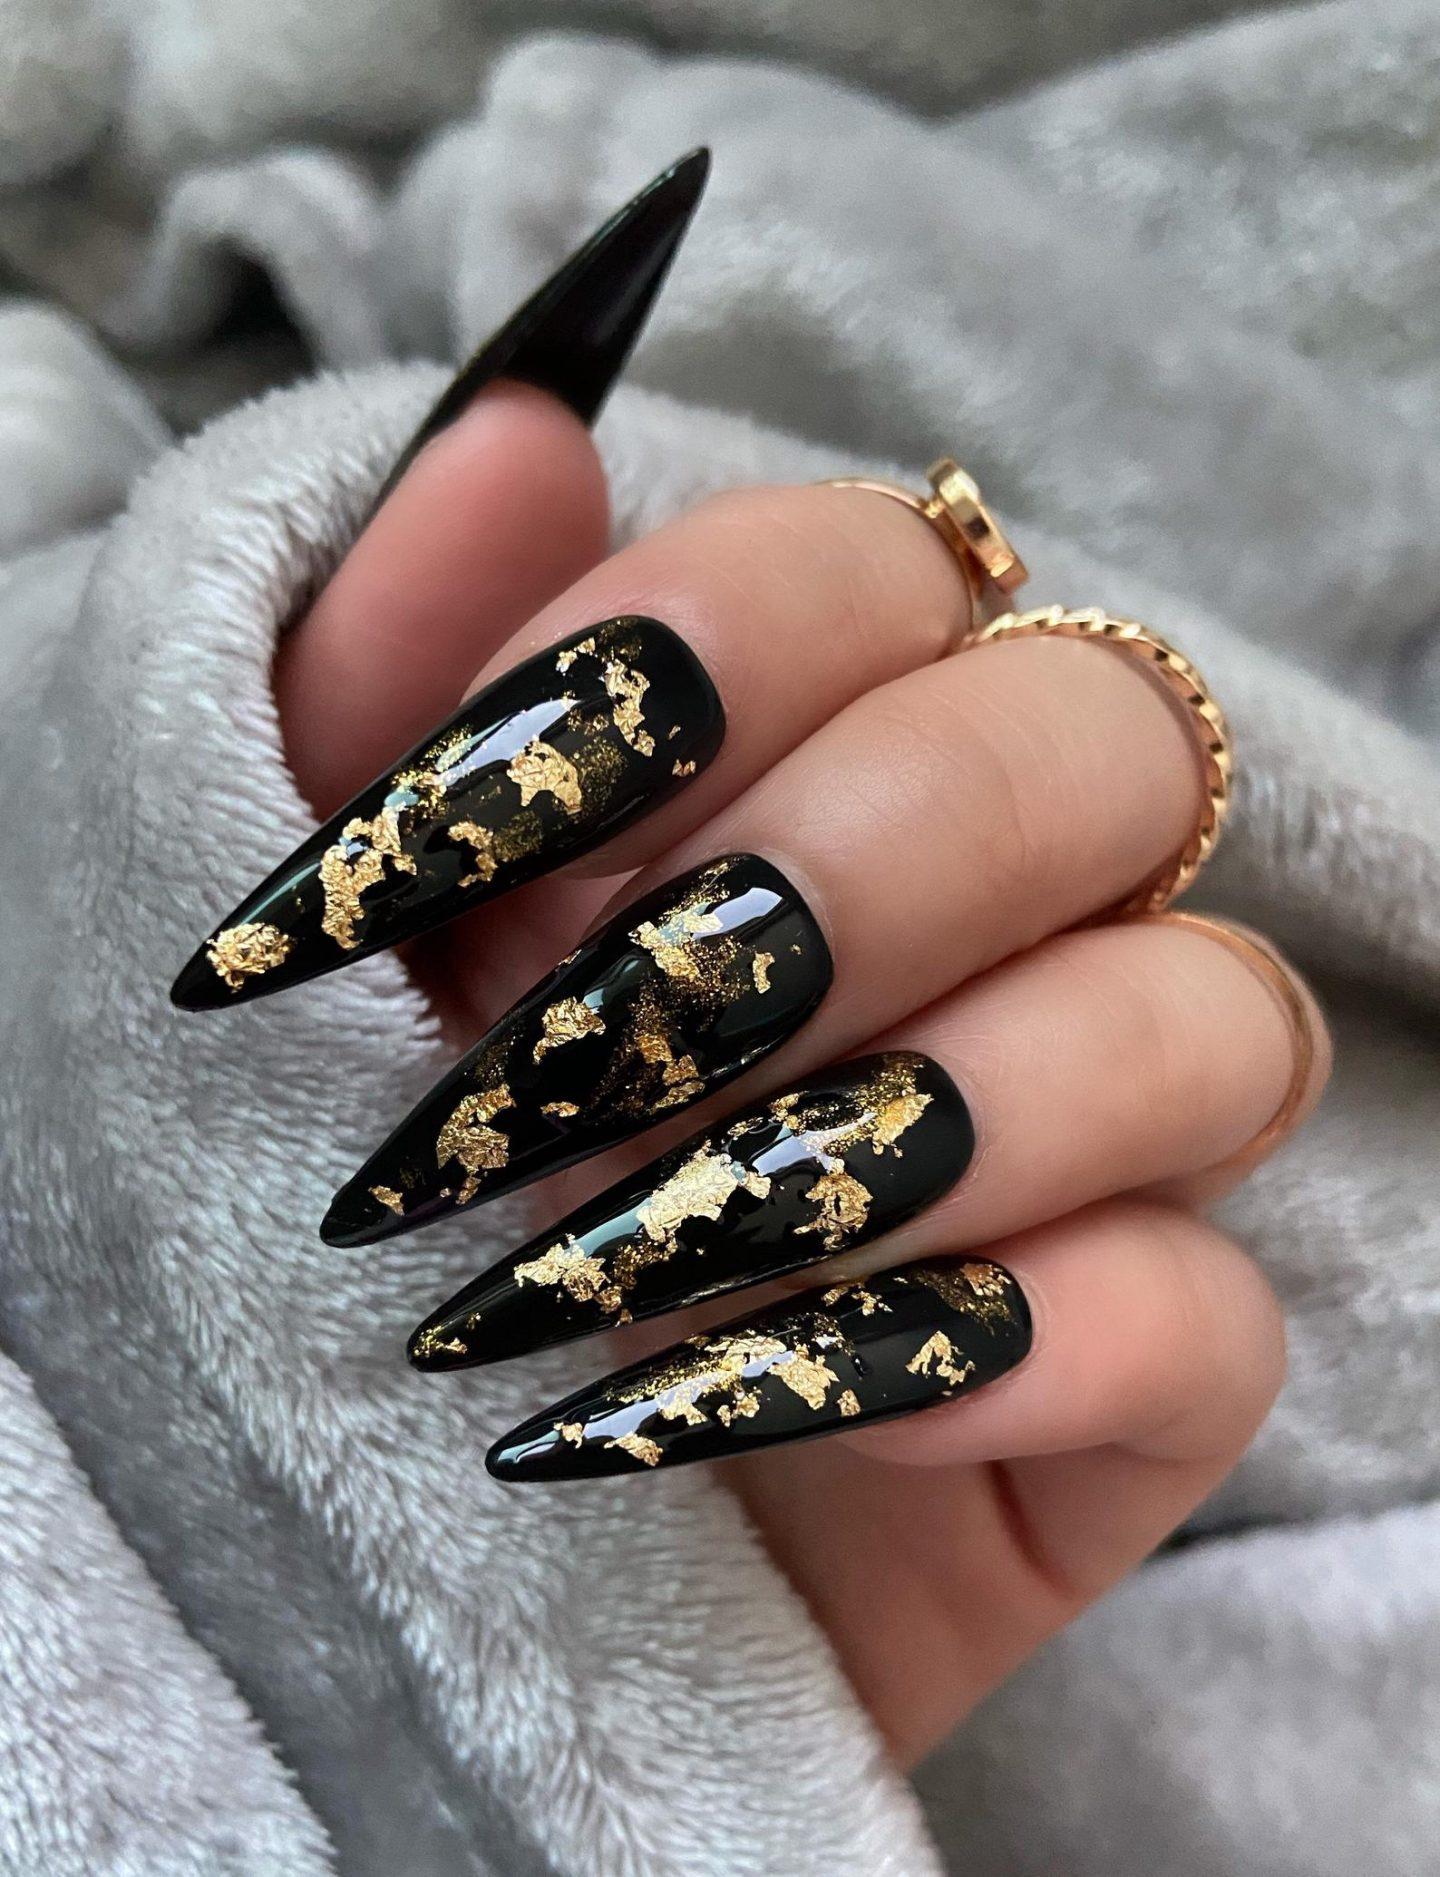 Black stiletto nails with gold foil